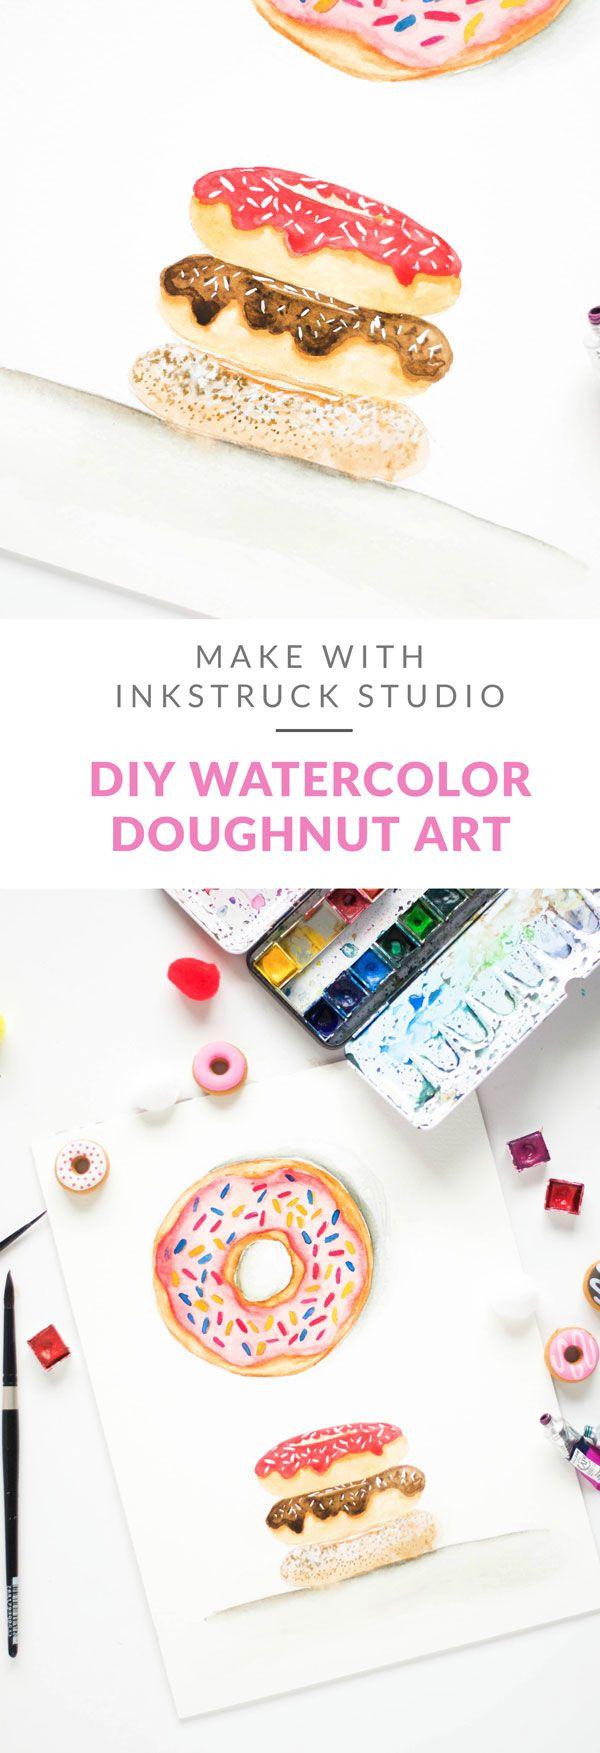 Learn the art of creating a DIY watercolor doughnut illustration in this tutorial - Inkstruck Studio